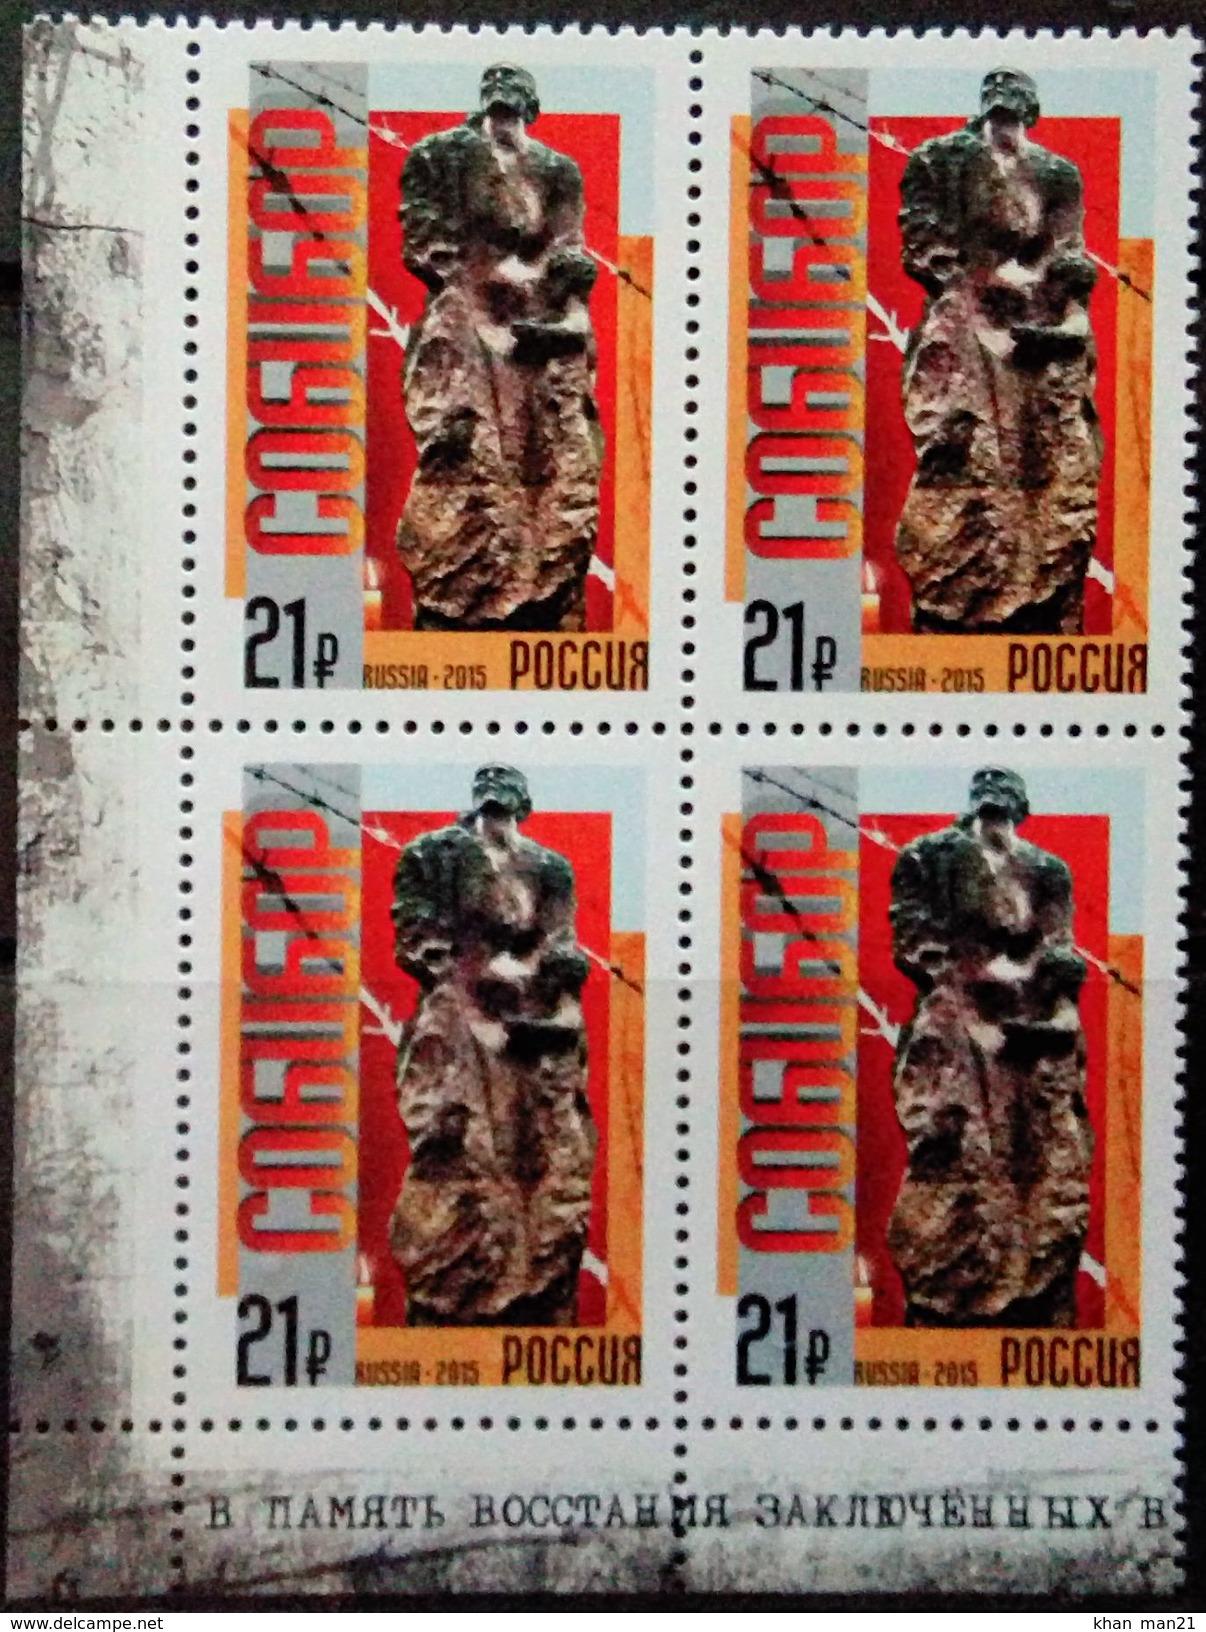 Russia, 2015, Mi. 2238, Uprising In The Sobibor Death Camp, WW II, MNH - 2. Weltkrieg